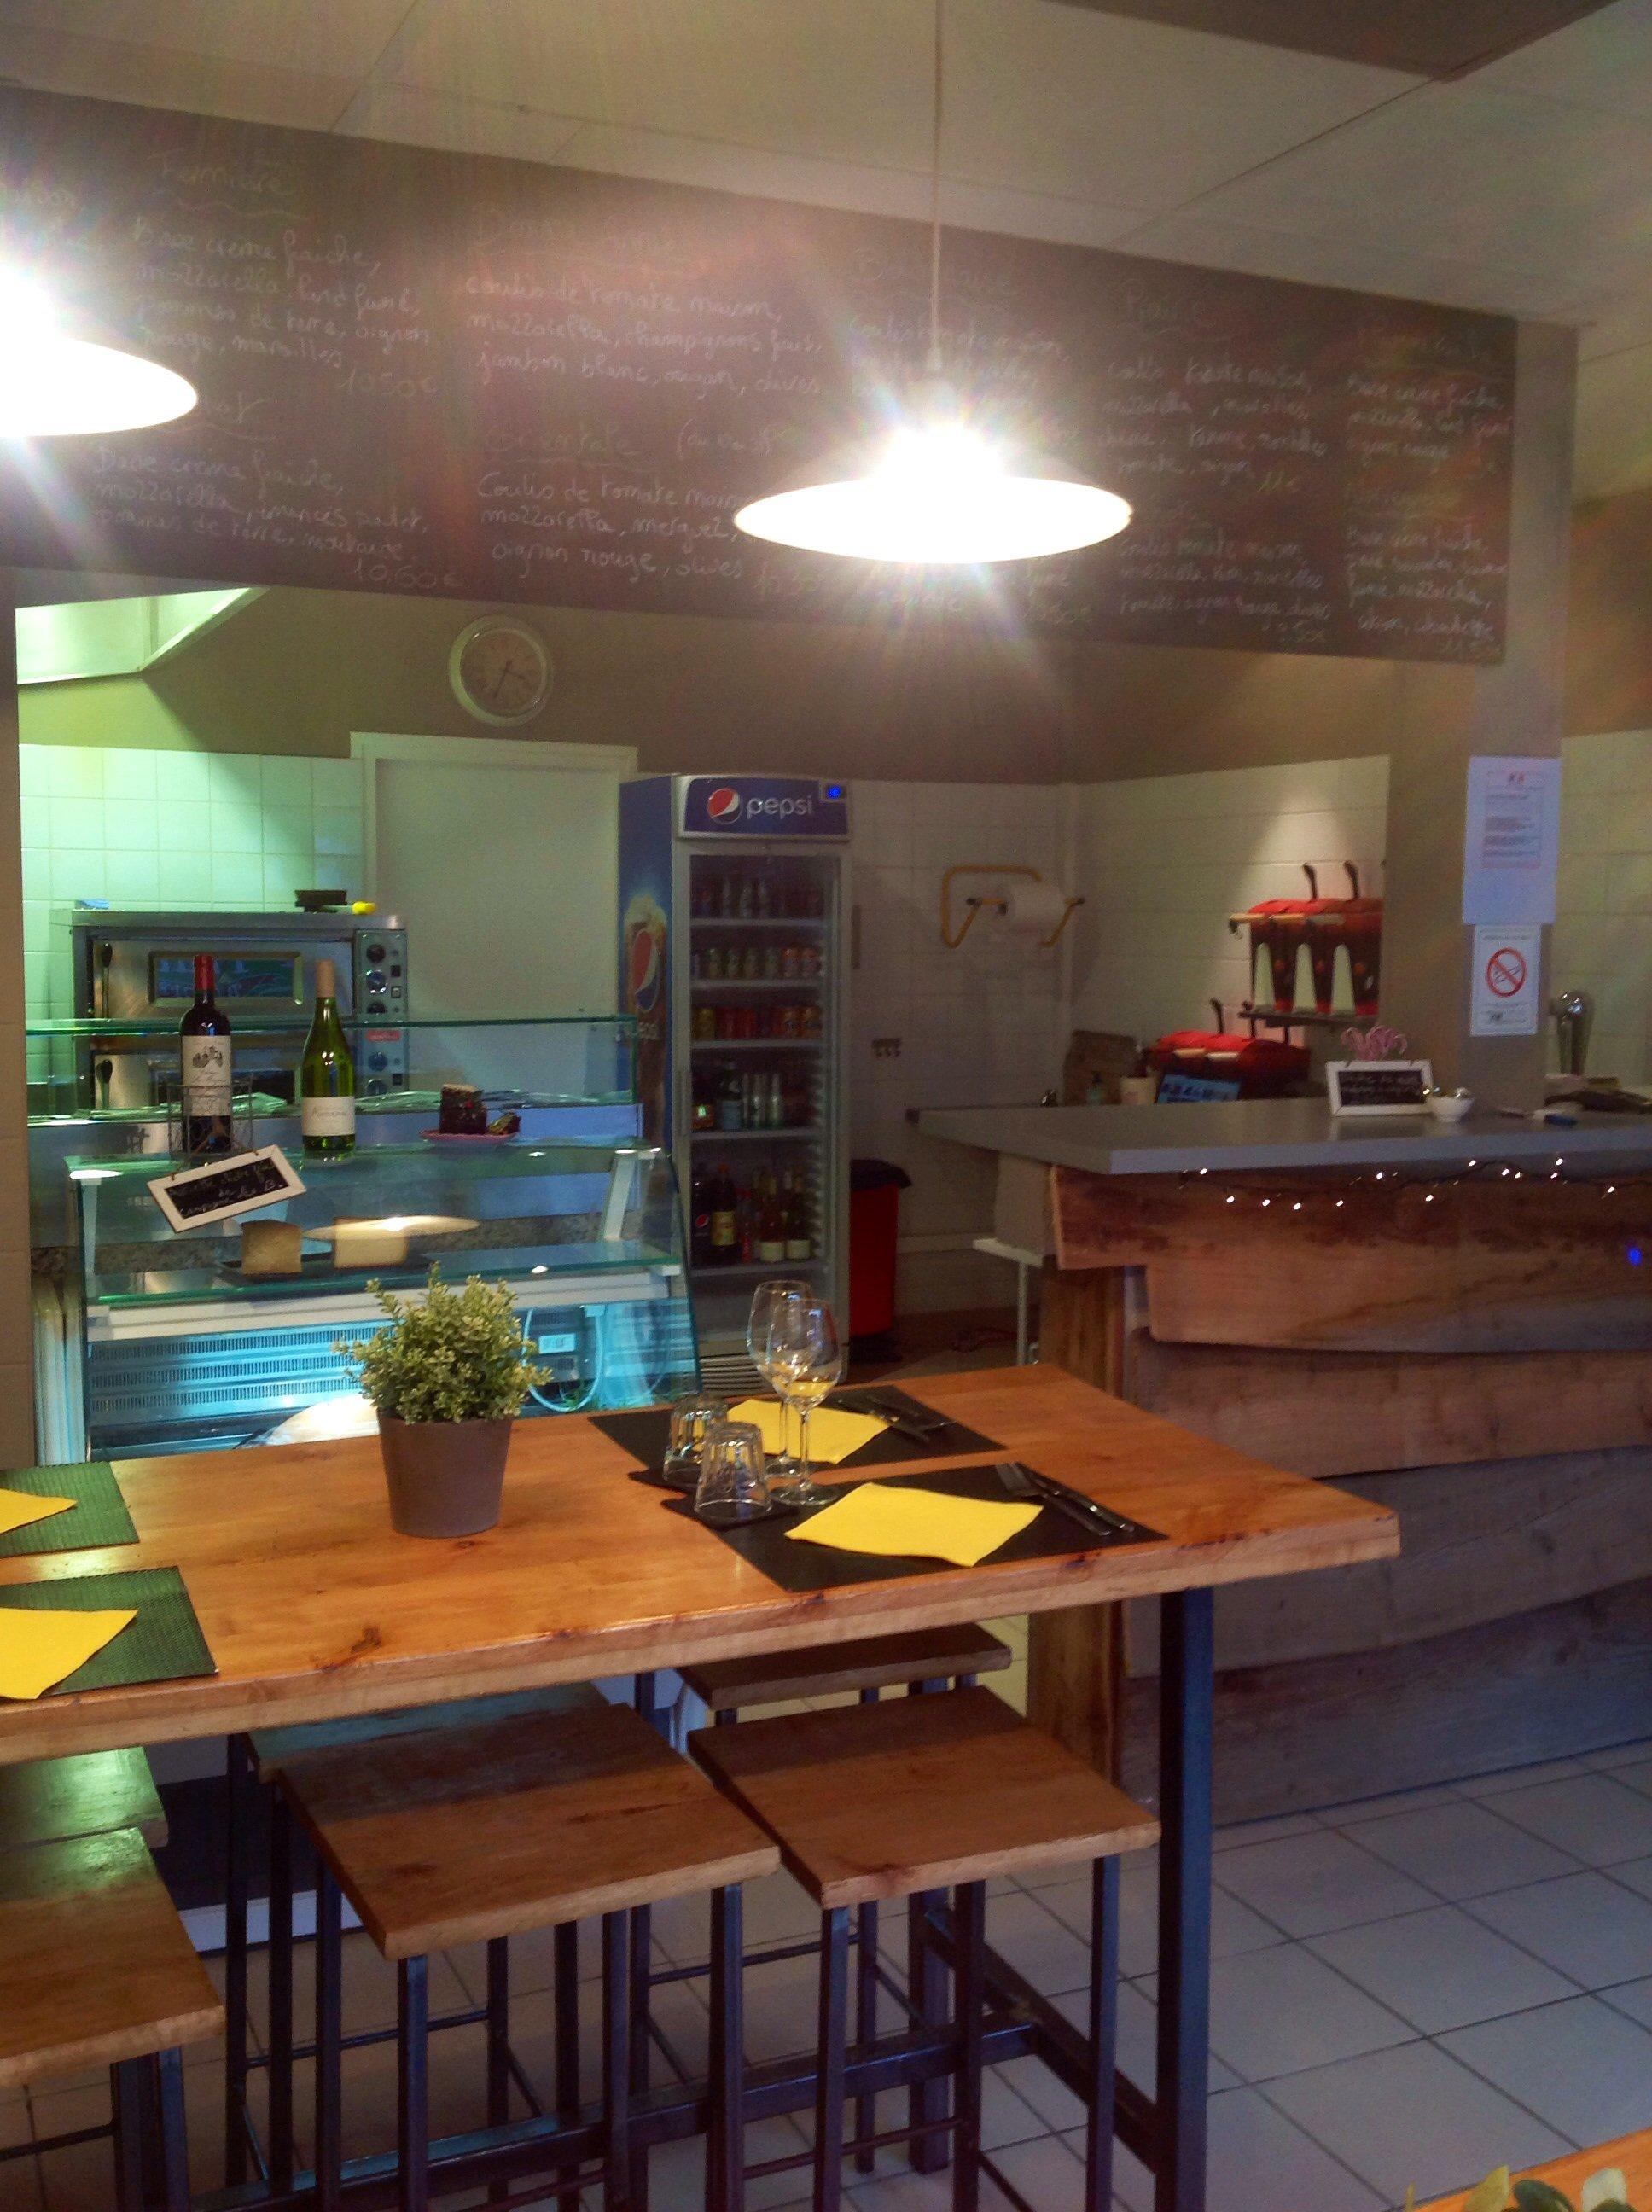 Terre a pizzas restaurant restauration rapide b thune 62400 - Cuisine rapide luxembourg ...